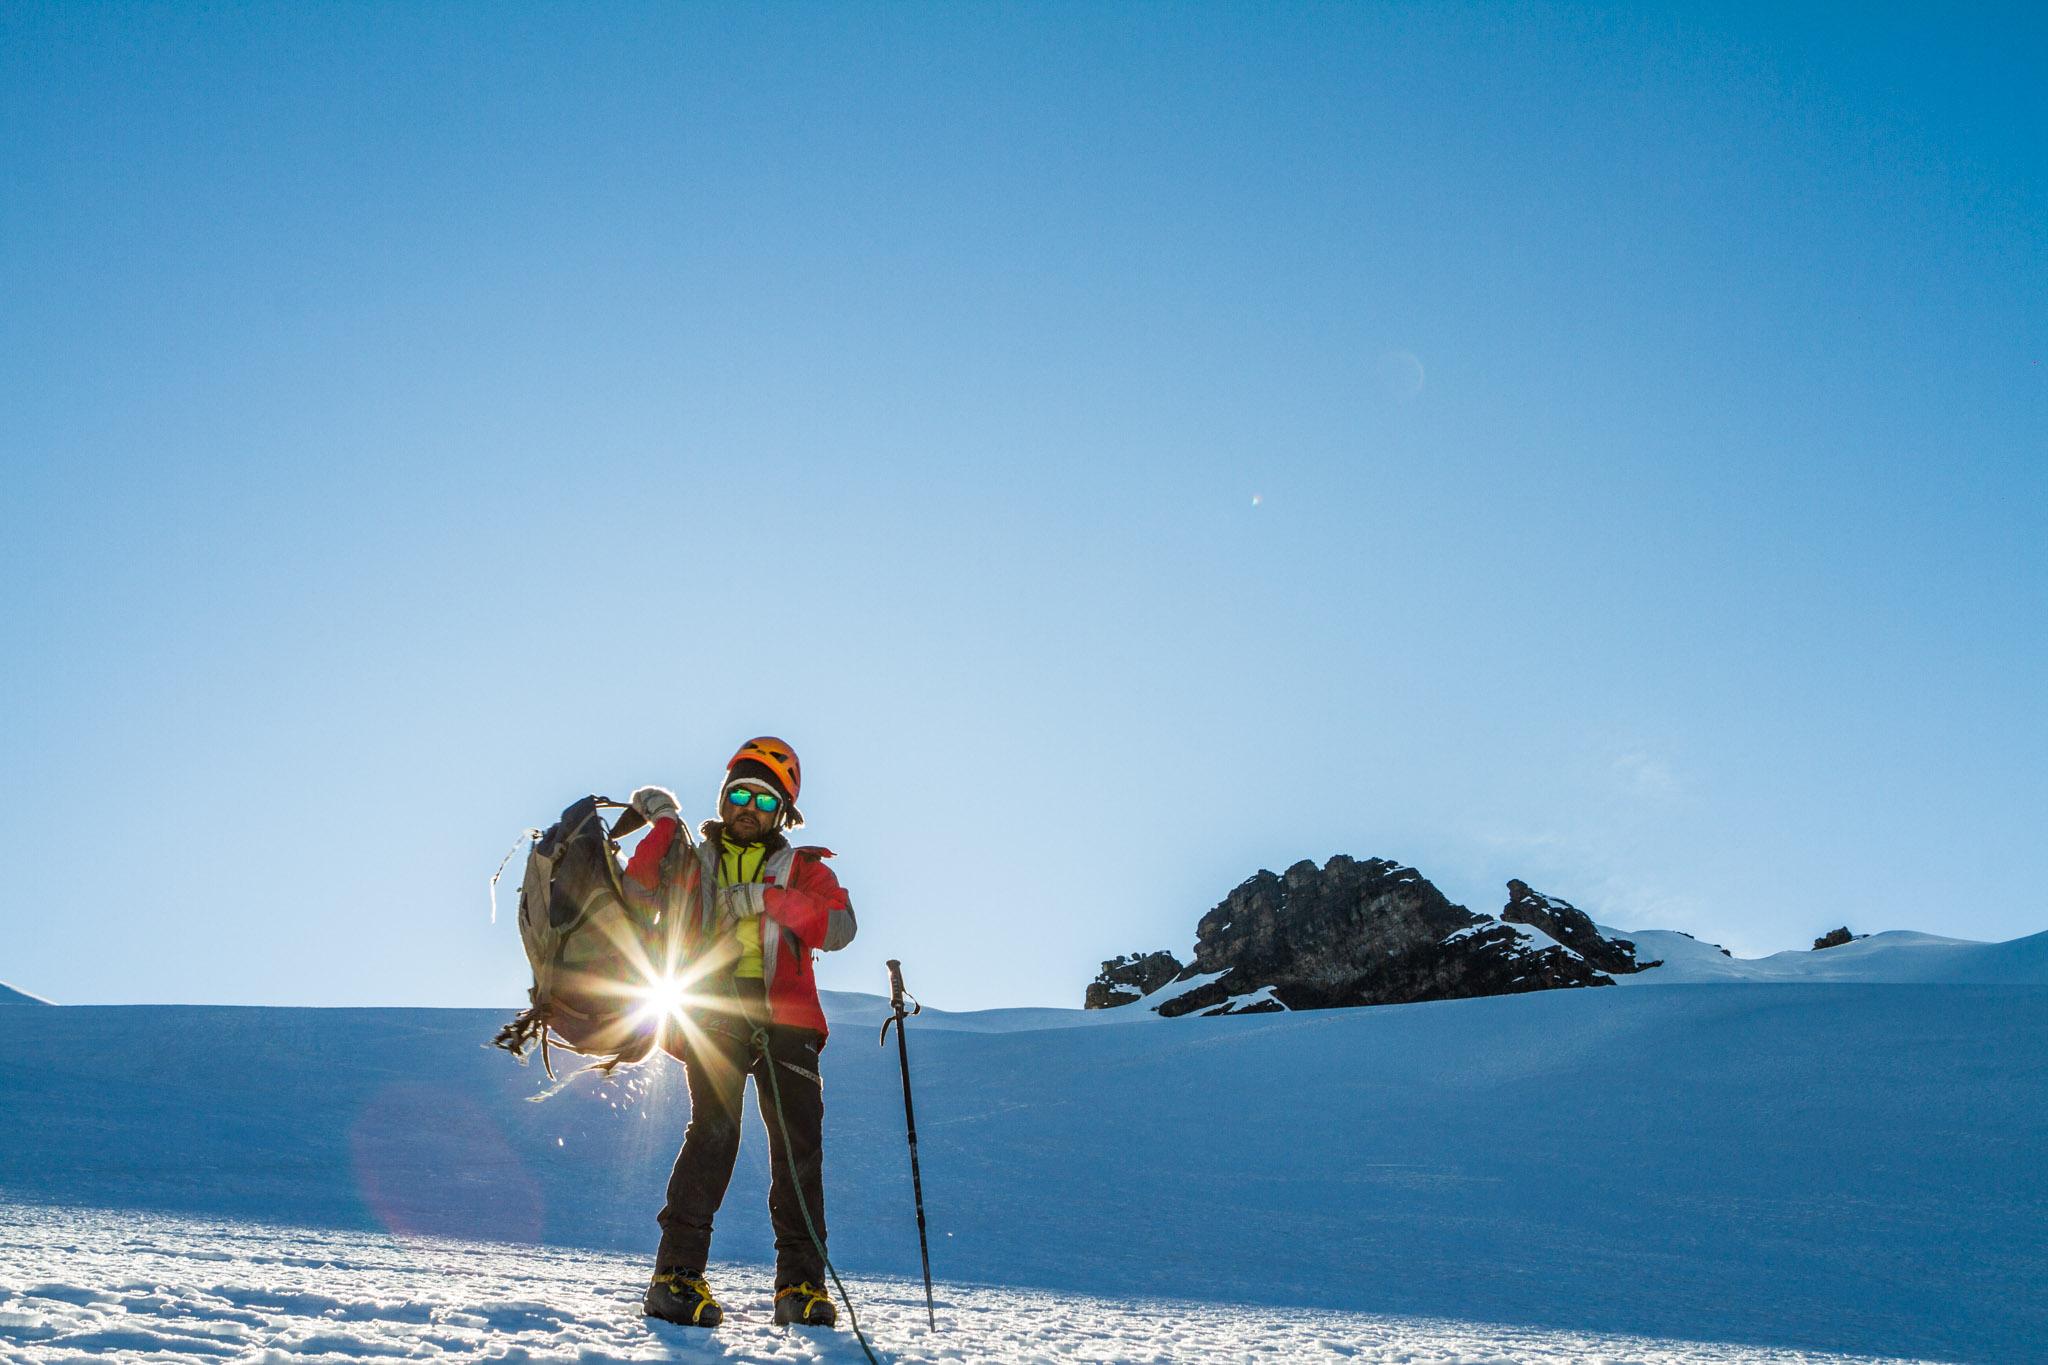 Ali-Barqawi-Studios-Explore-Series-Travel-Adventure-Documentary-C4CGAZA-Bolivia-Mount-Tarija-2015-163.jpg